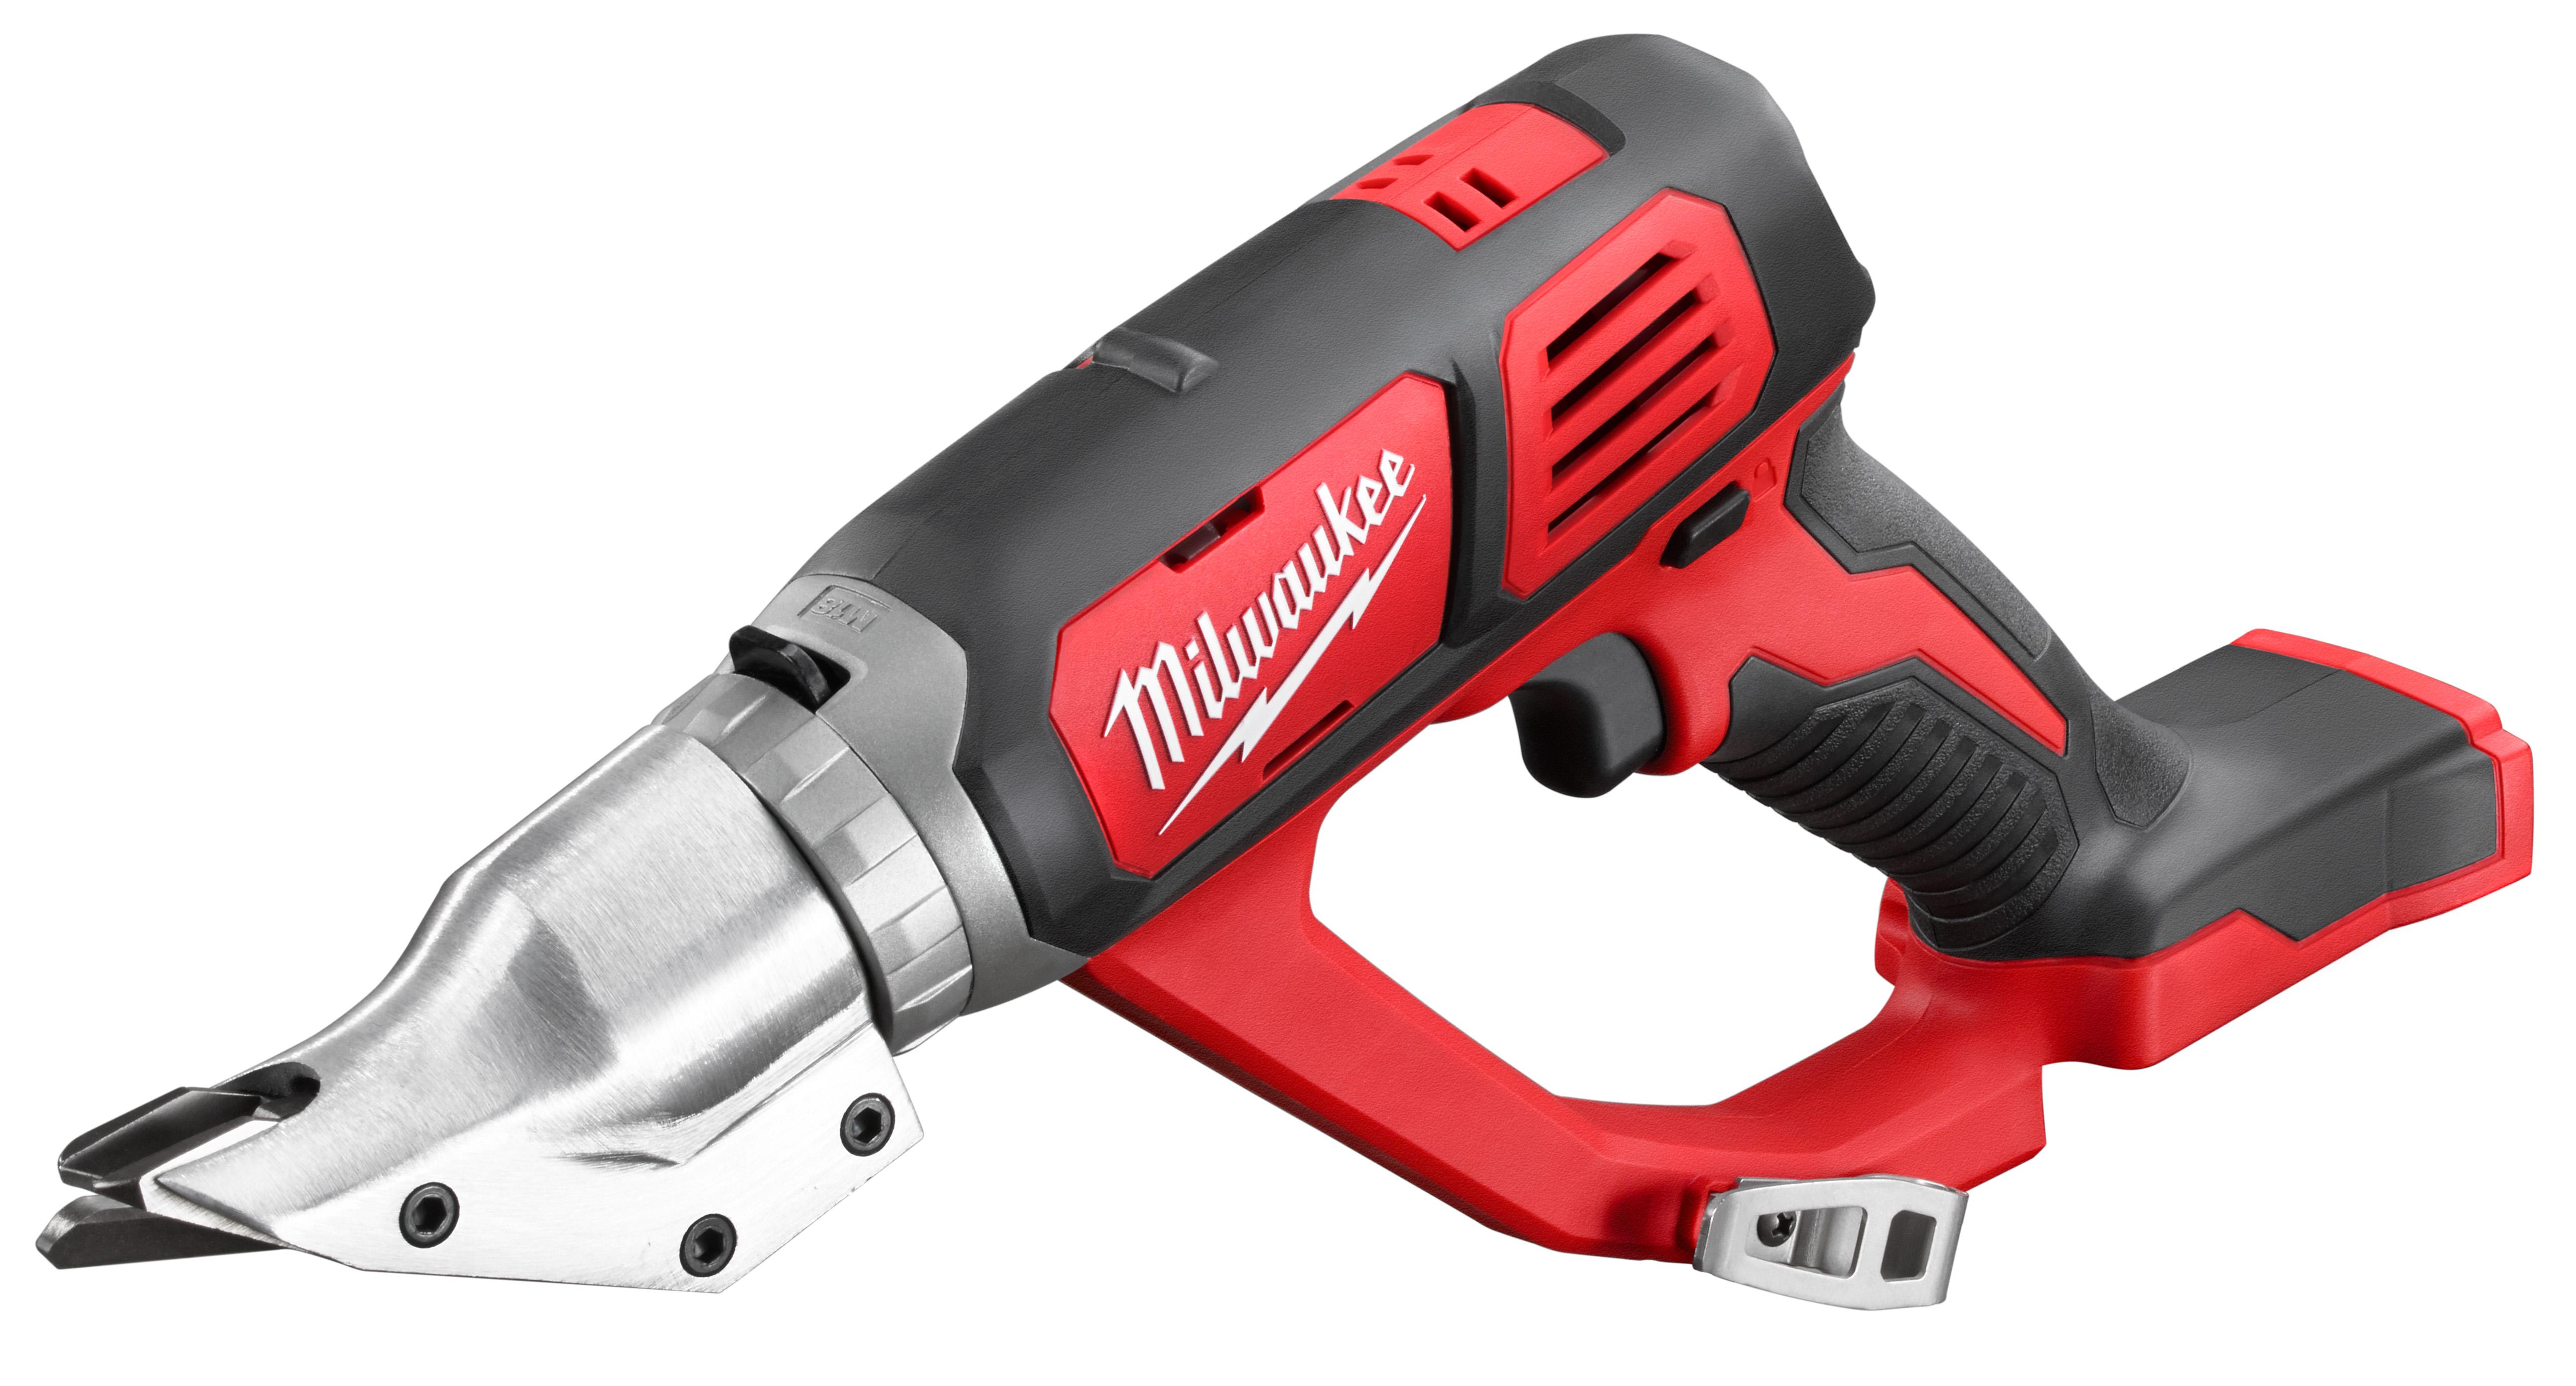 Milwaukee 2635-20 M18™ Cordless 18 Gauge Double Cut Shear